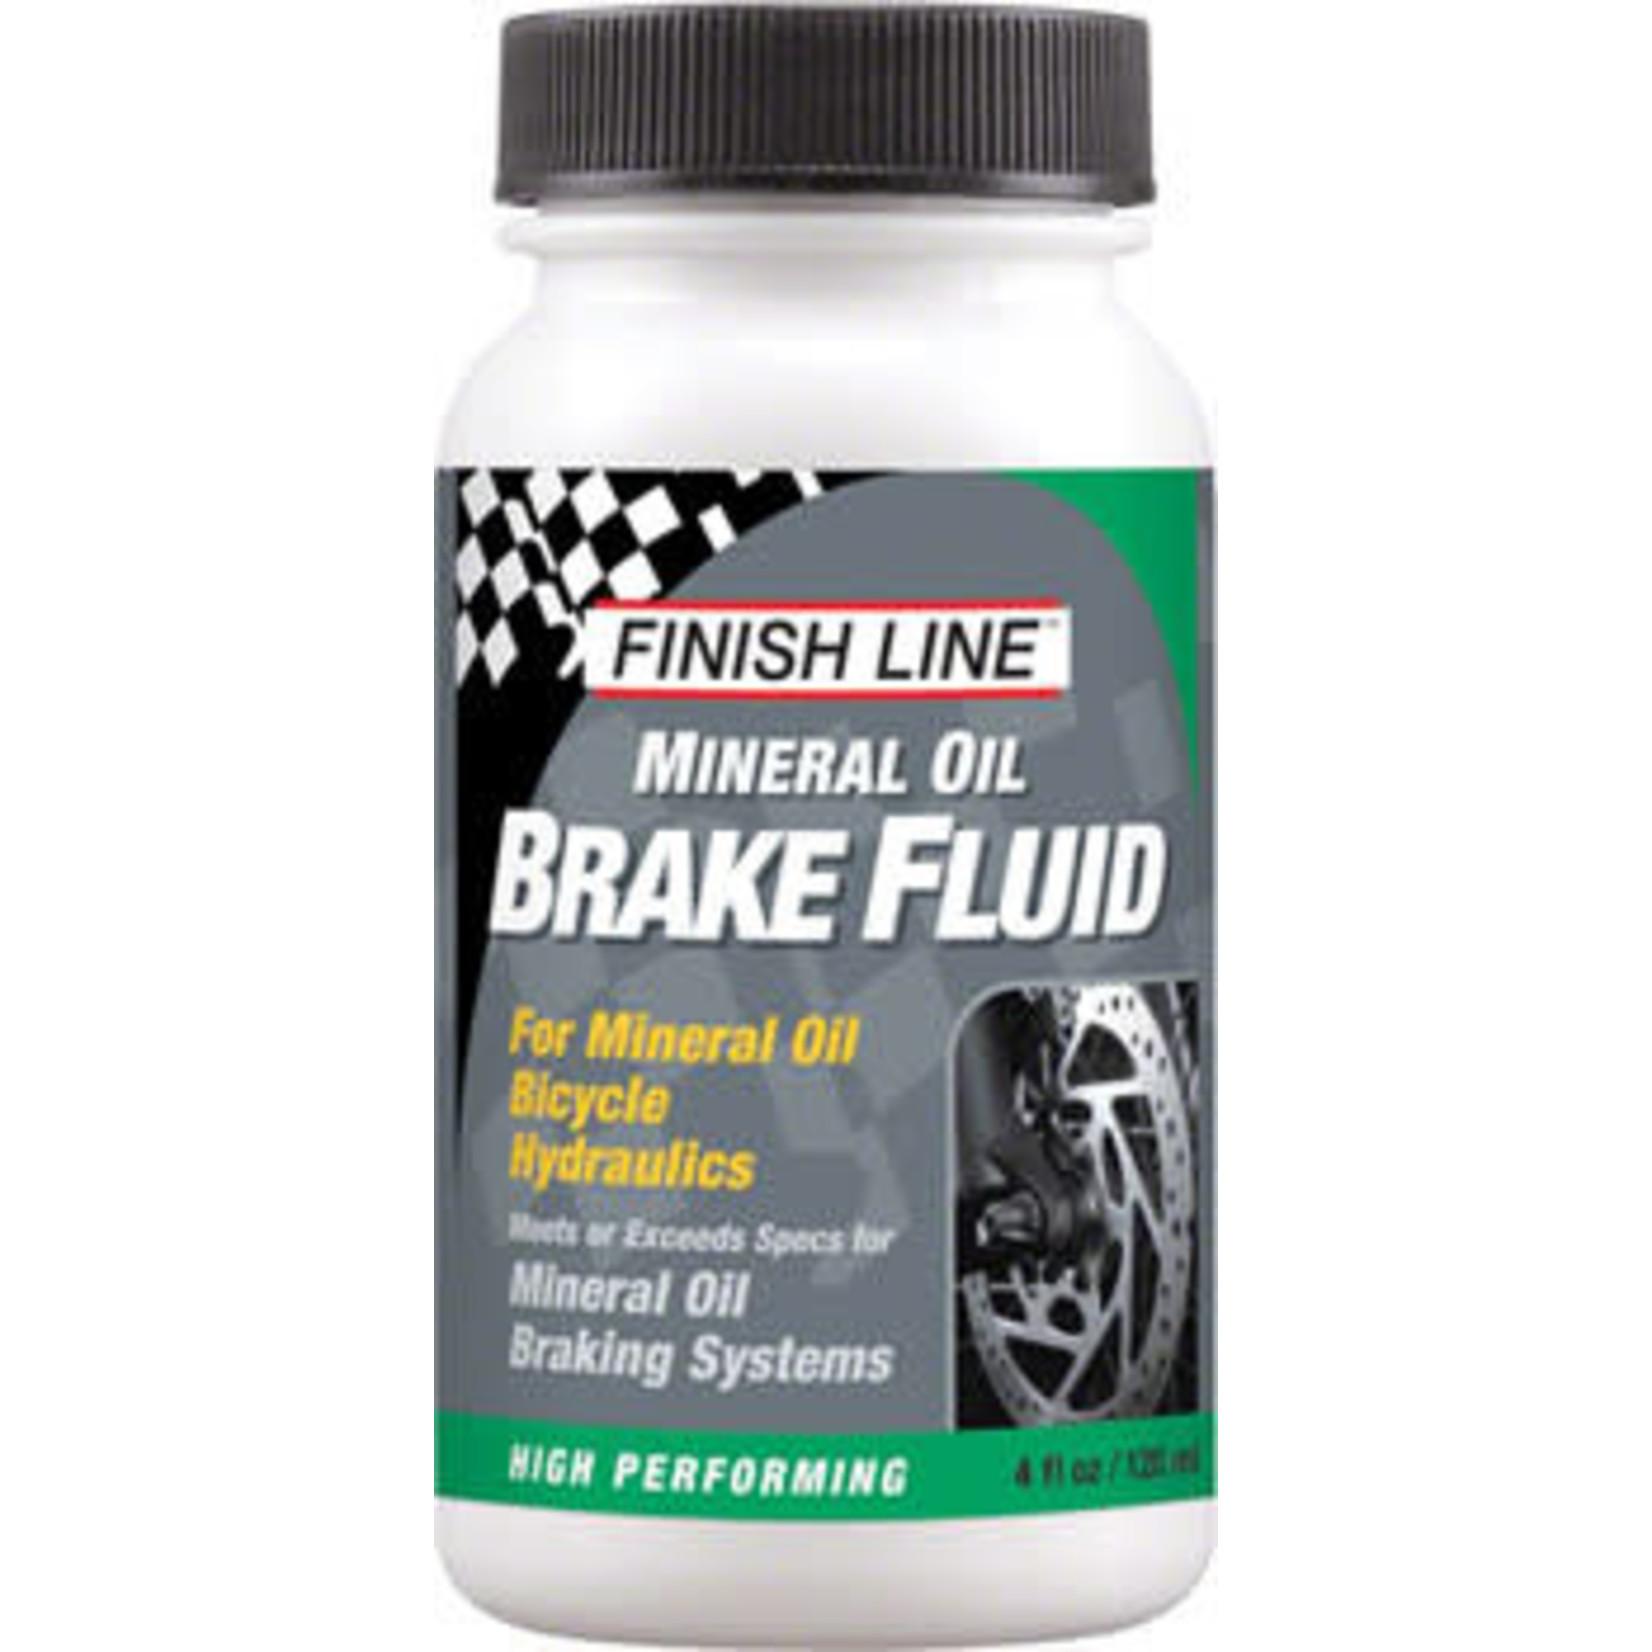 Finish Line Mineral Oil Brake Fluid, 4oz